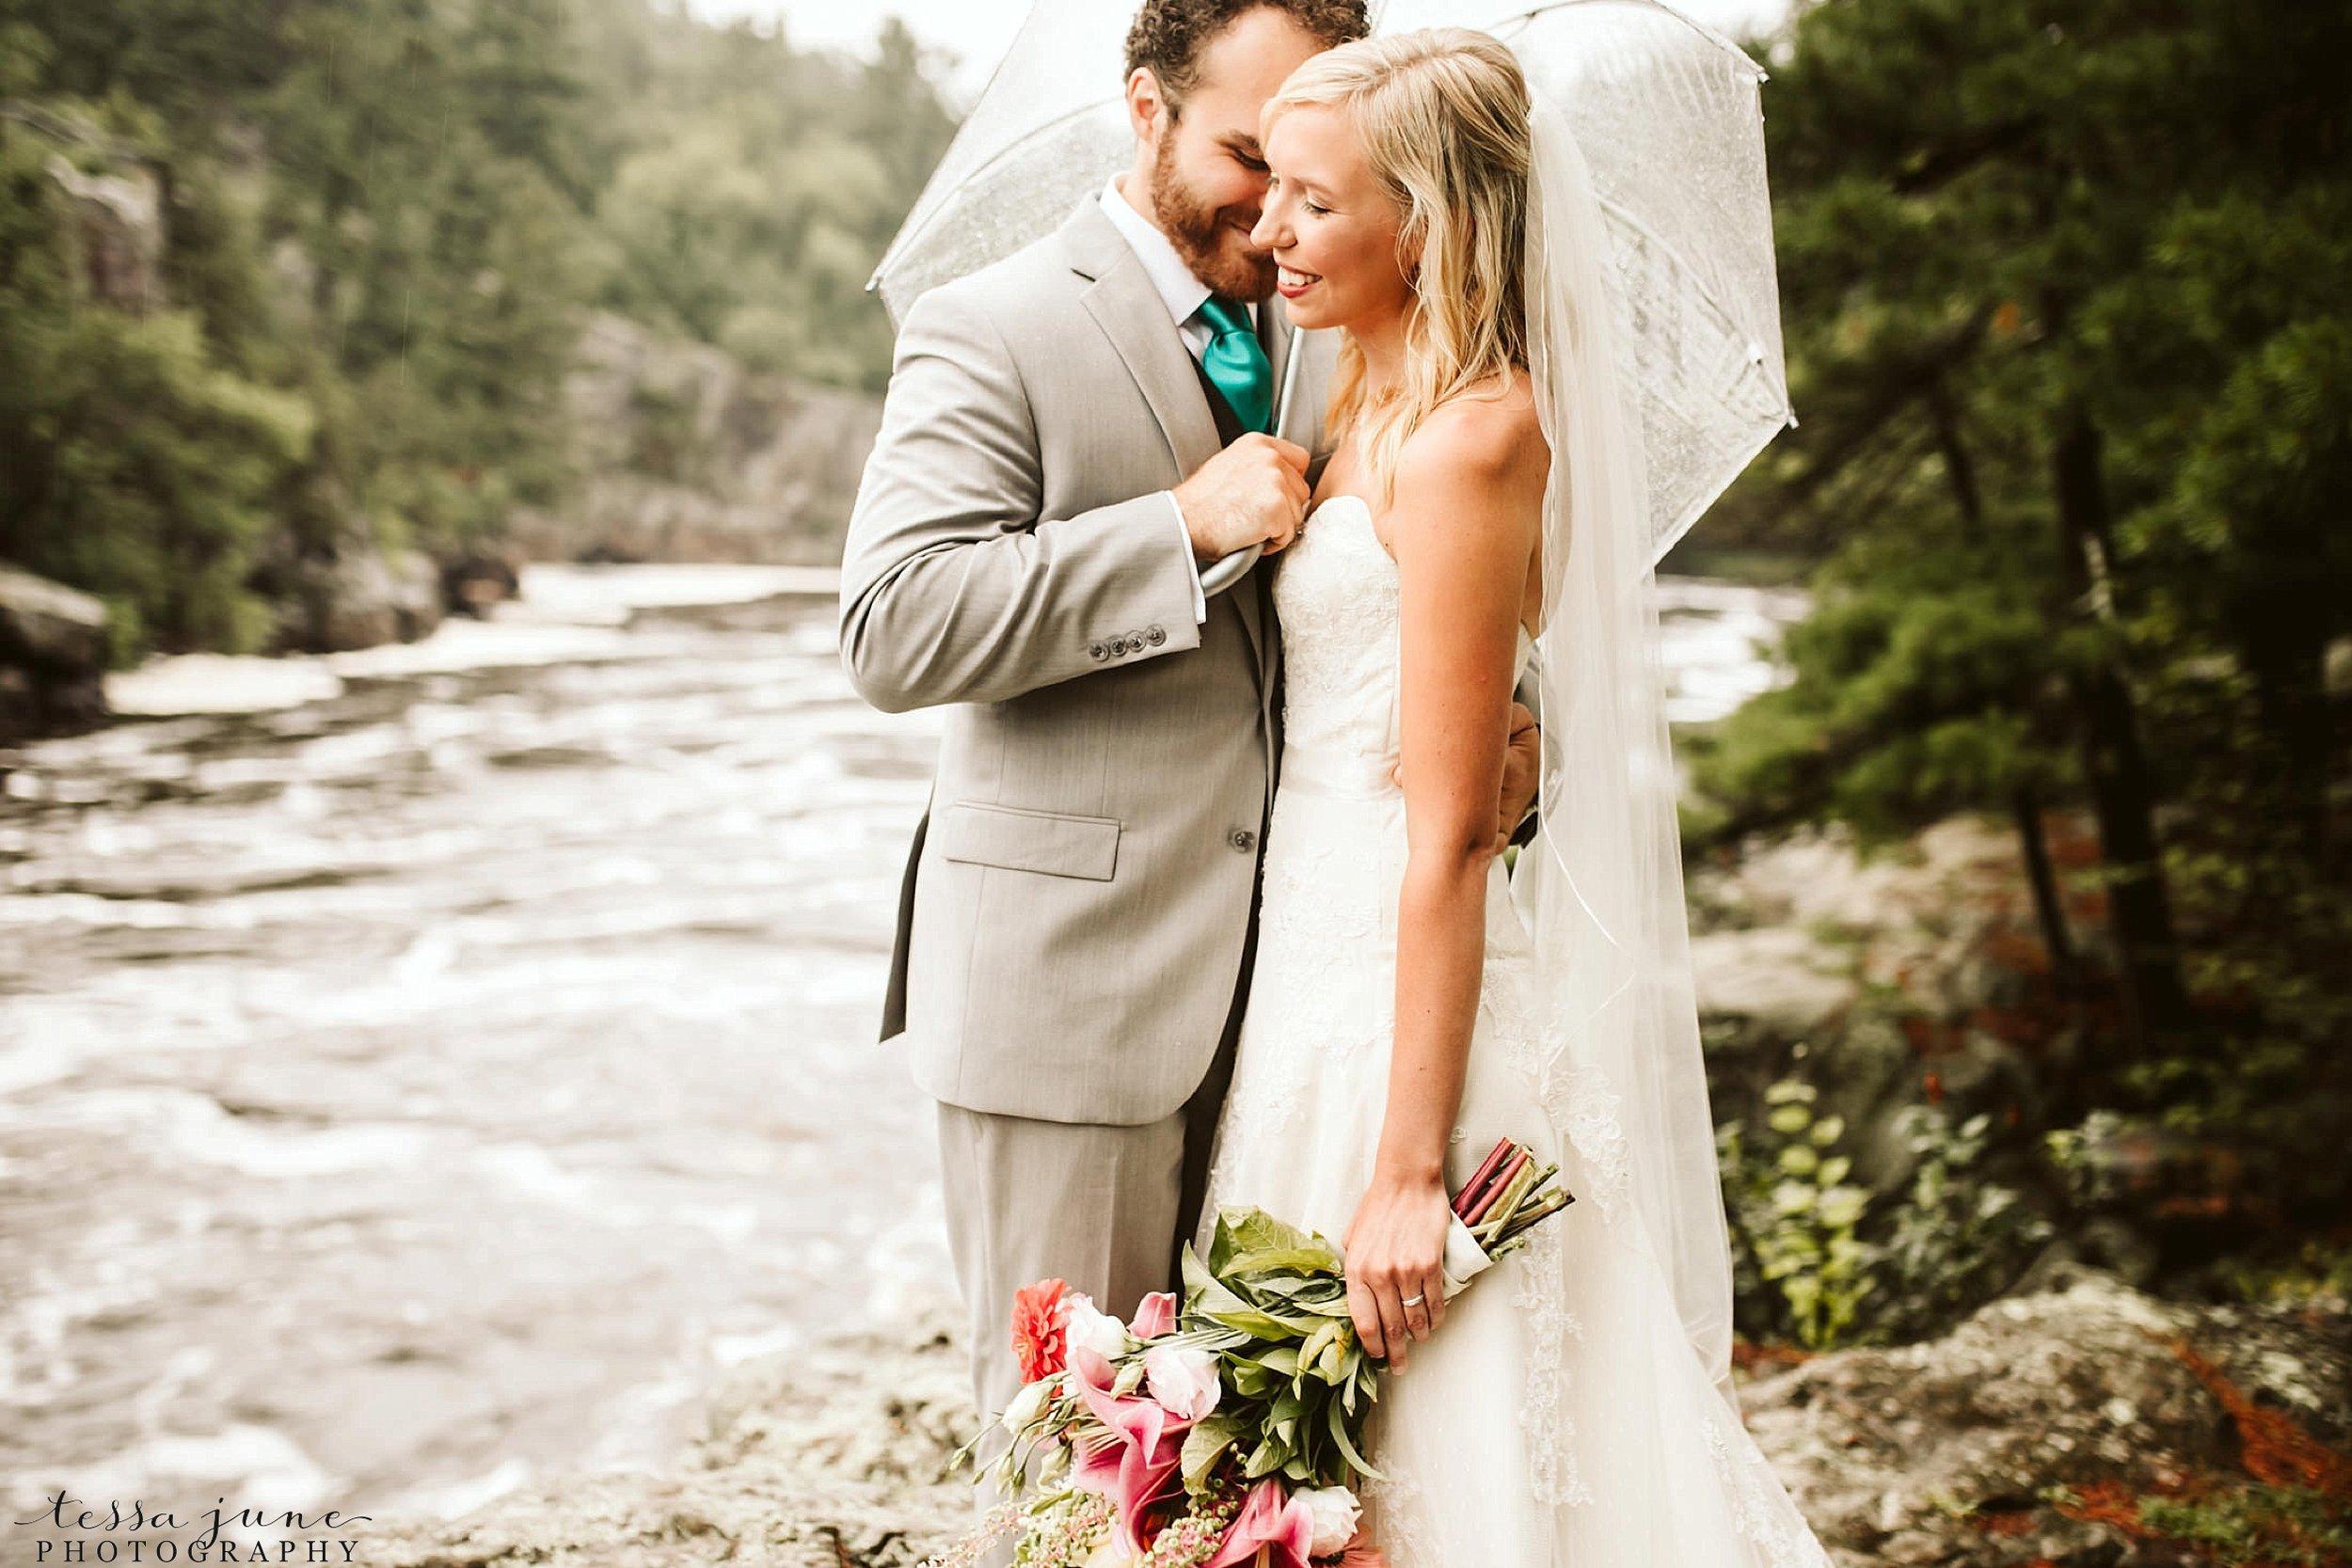 taylors-falls-rainy-elopement-wedding-interstate-state-park-4.jpg